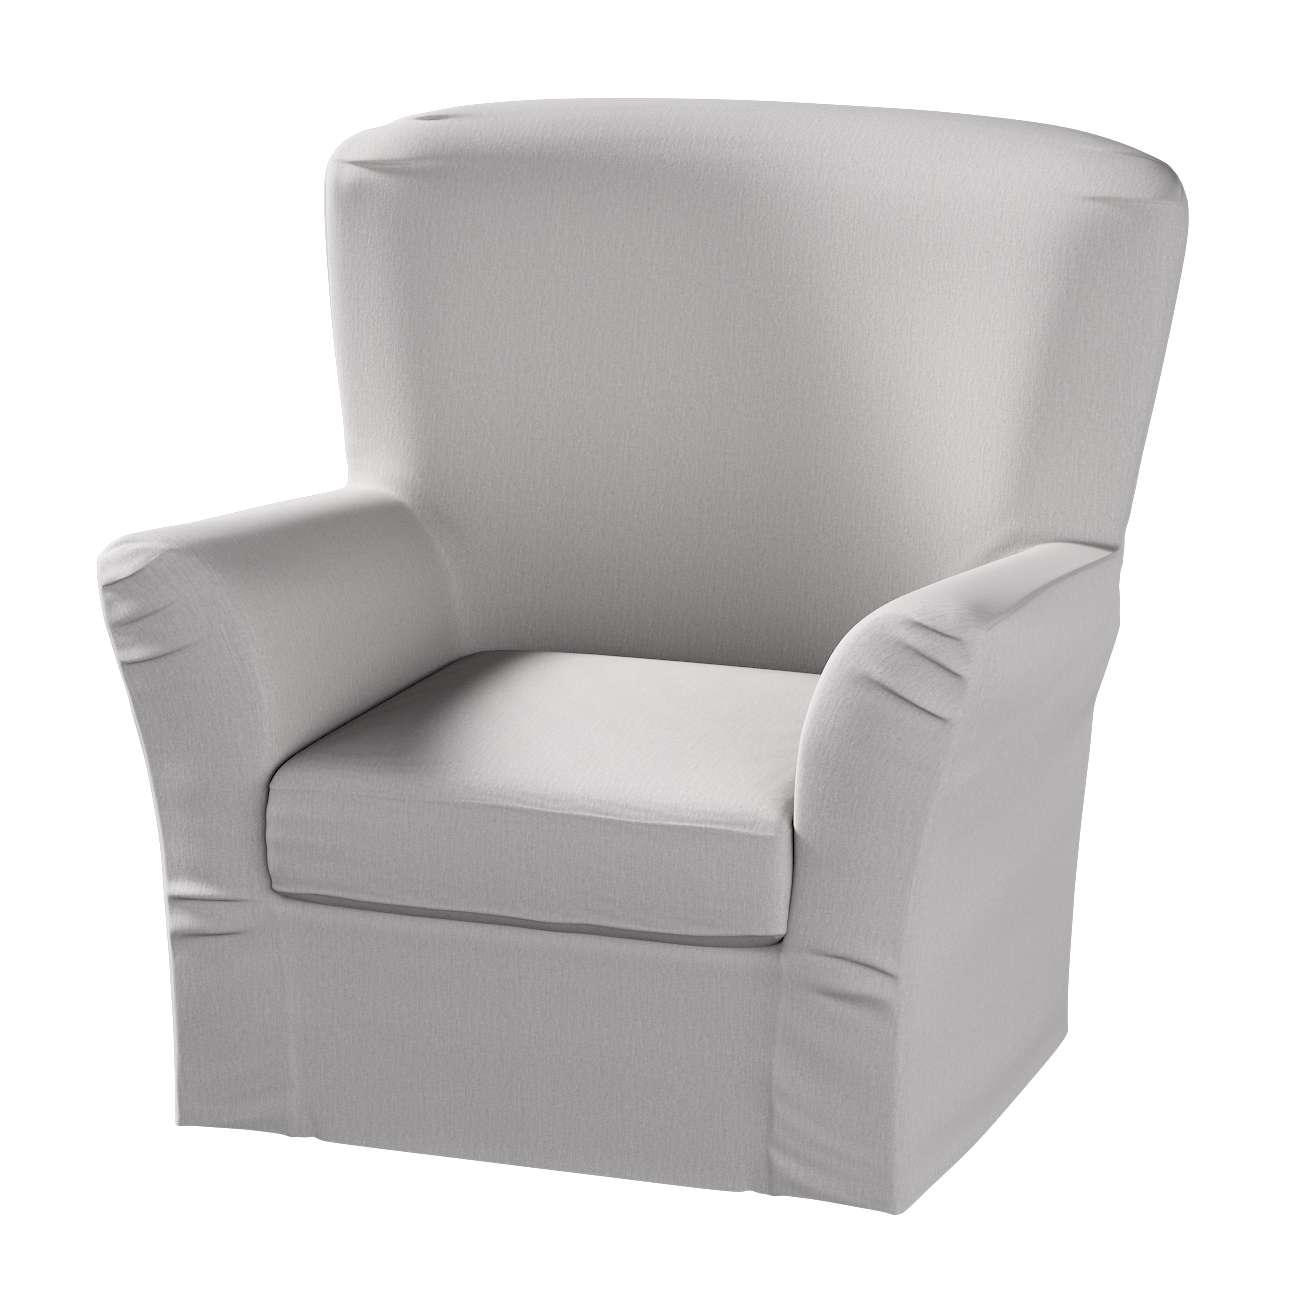 TOMELILLA fotelio užvalkalas TOMELILLA fotelis kolekcijoje Chenille, audinys: 702-23